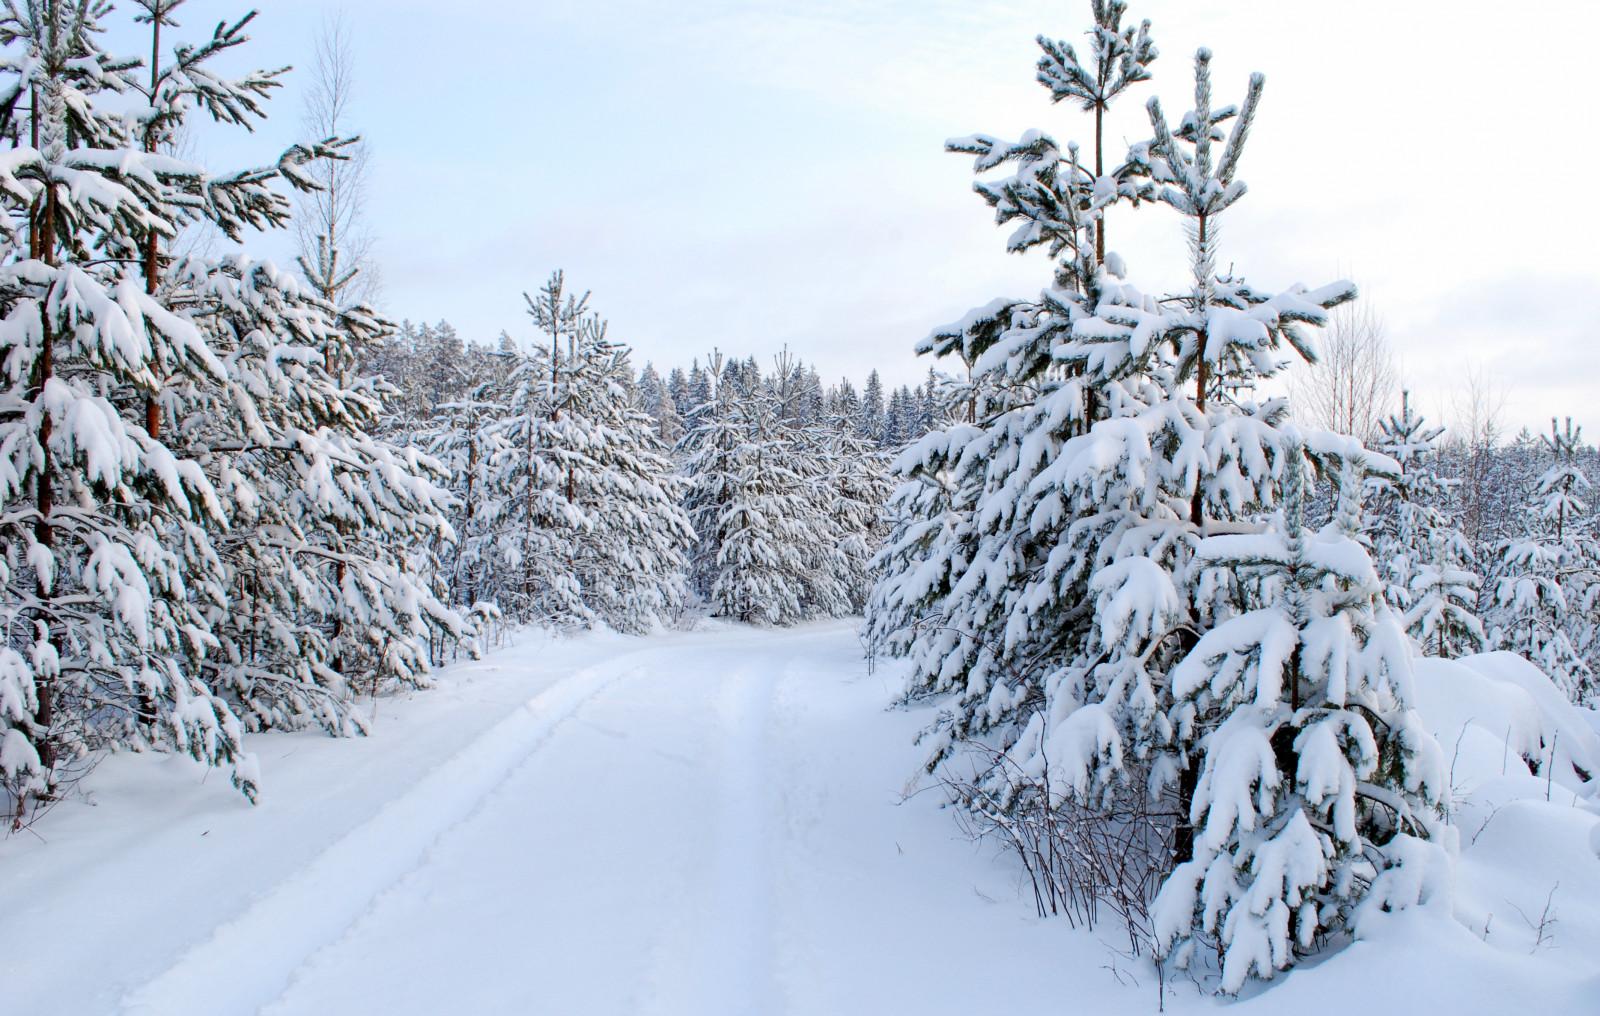 Foto Di Natale Neve Inverno 94.Sfondi Alberi Bianca La Neve Inverno Strada Ramo Leone